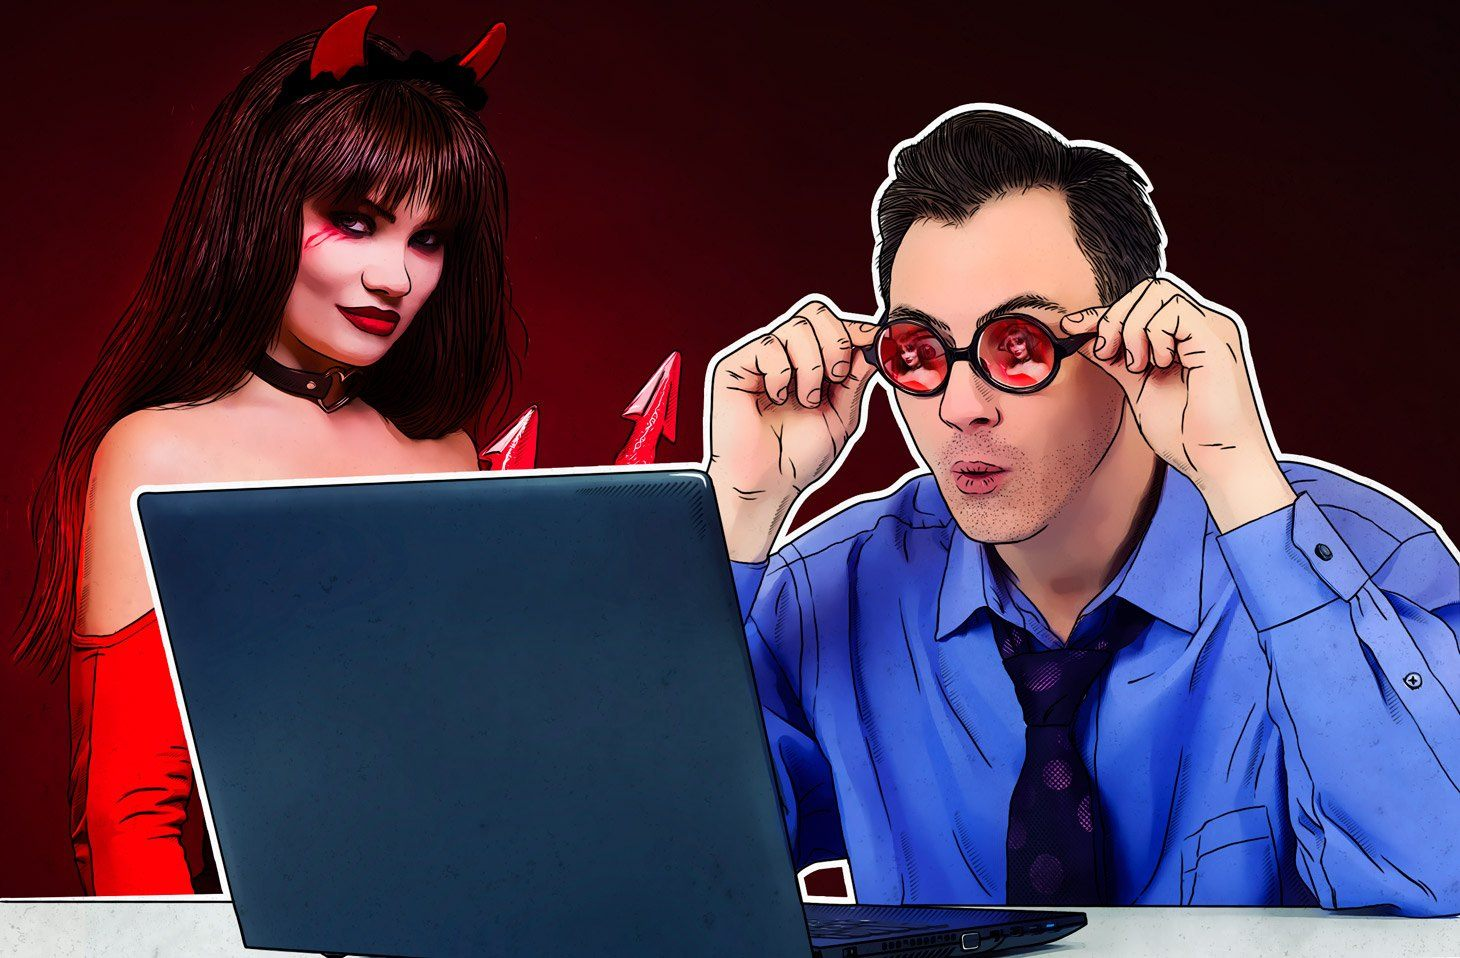 Adult Porn Blog porn sites mean malware — fact or fiction?   kaspersky